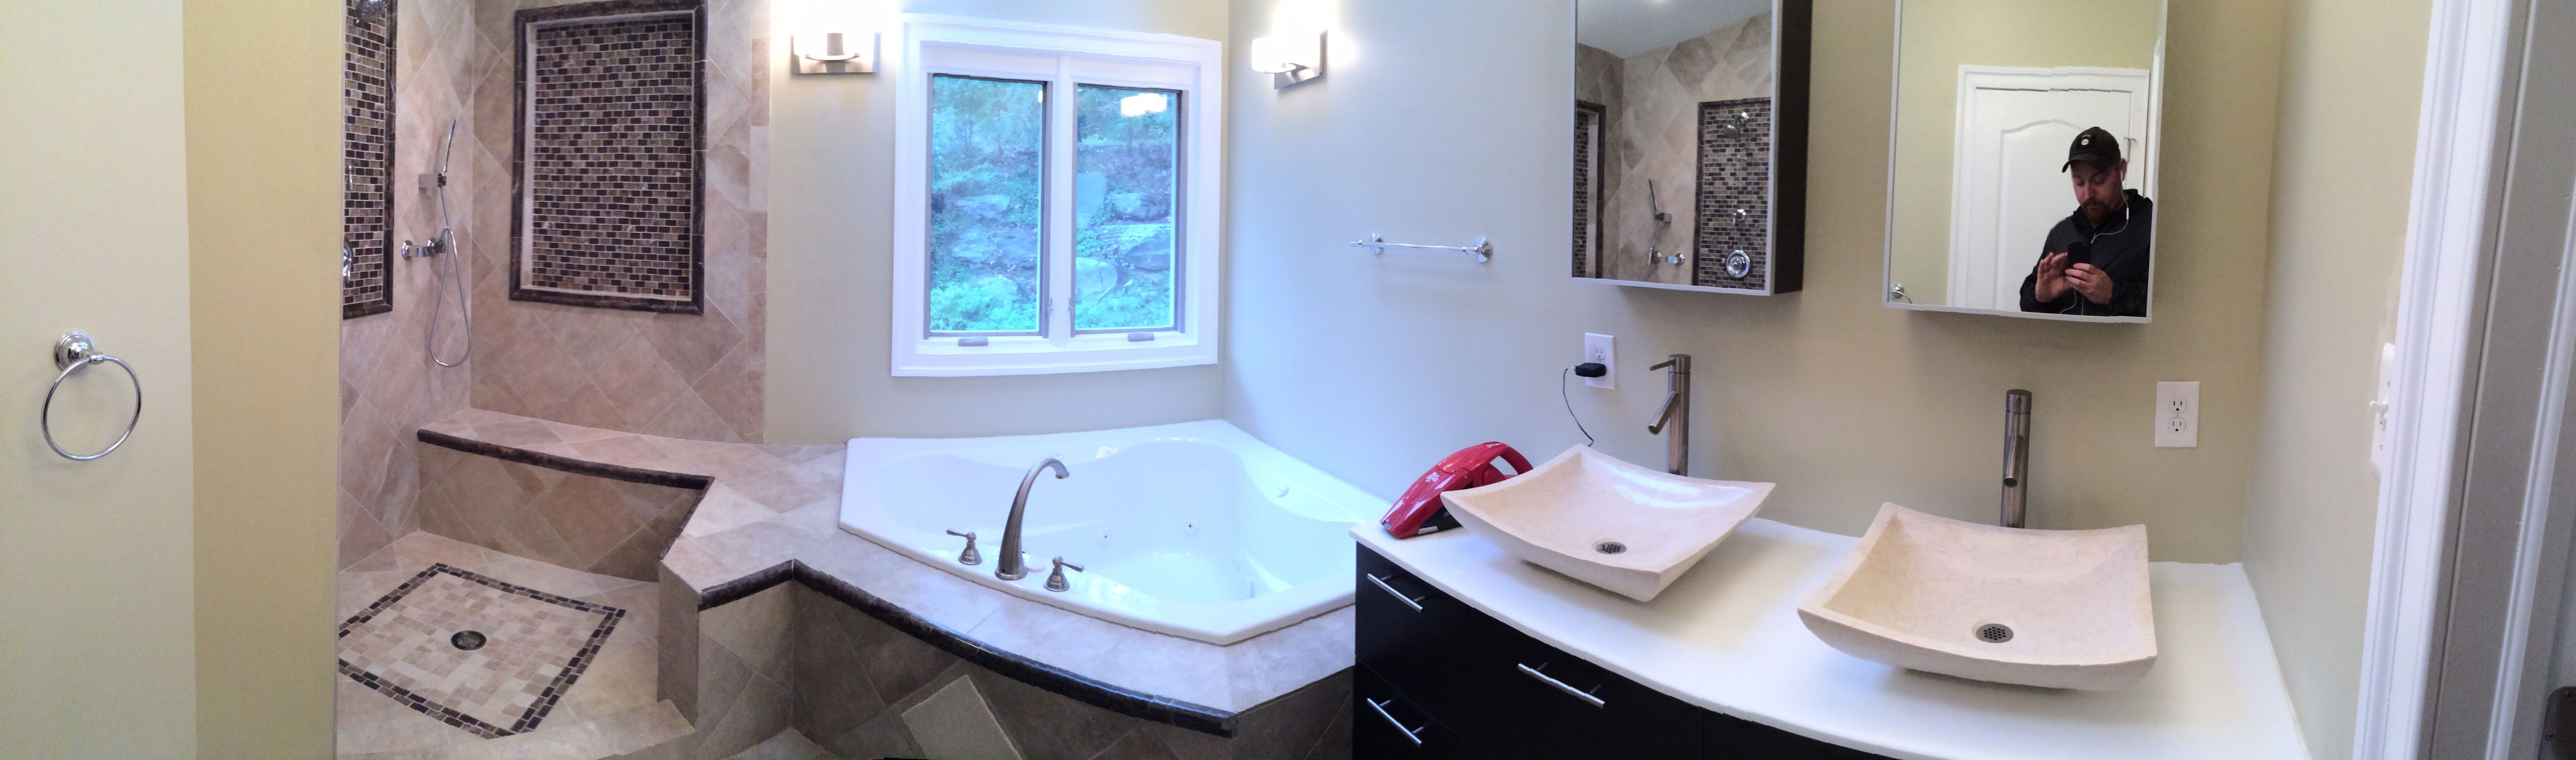 Corner bath tub in the cool master! Creativeedgeconstruction.com ...